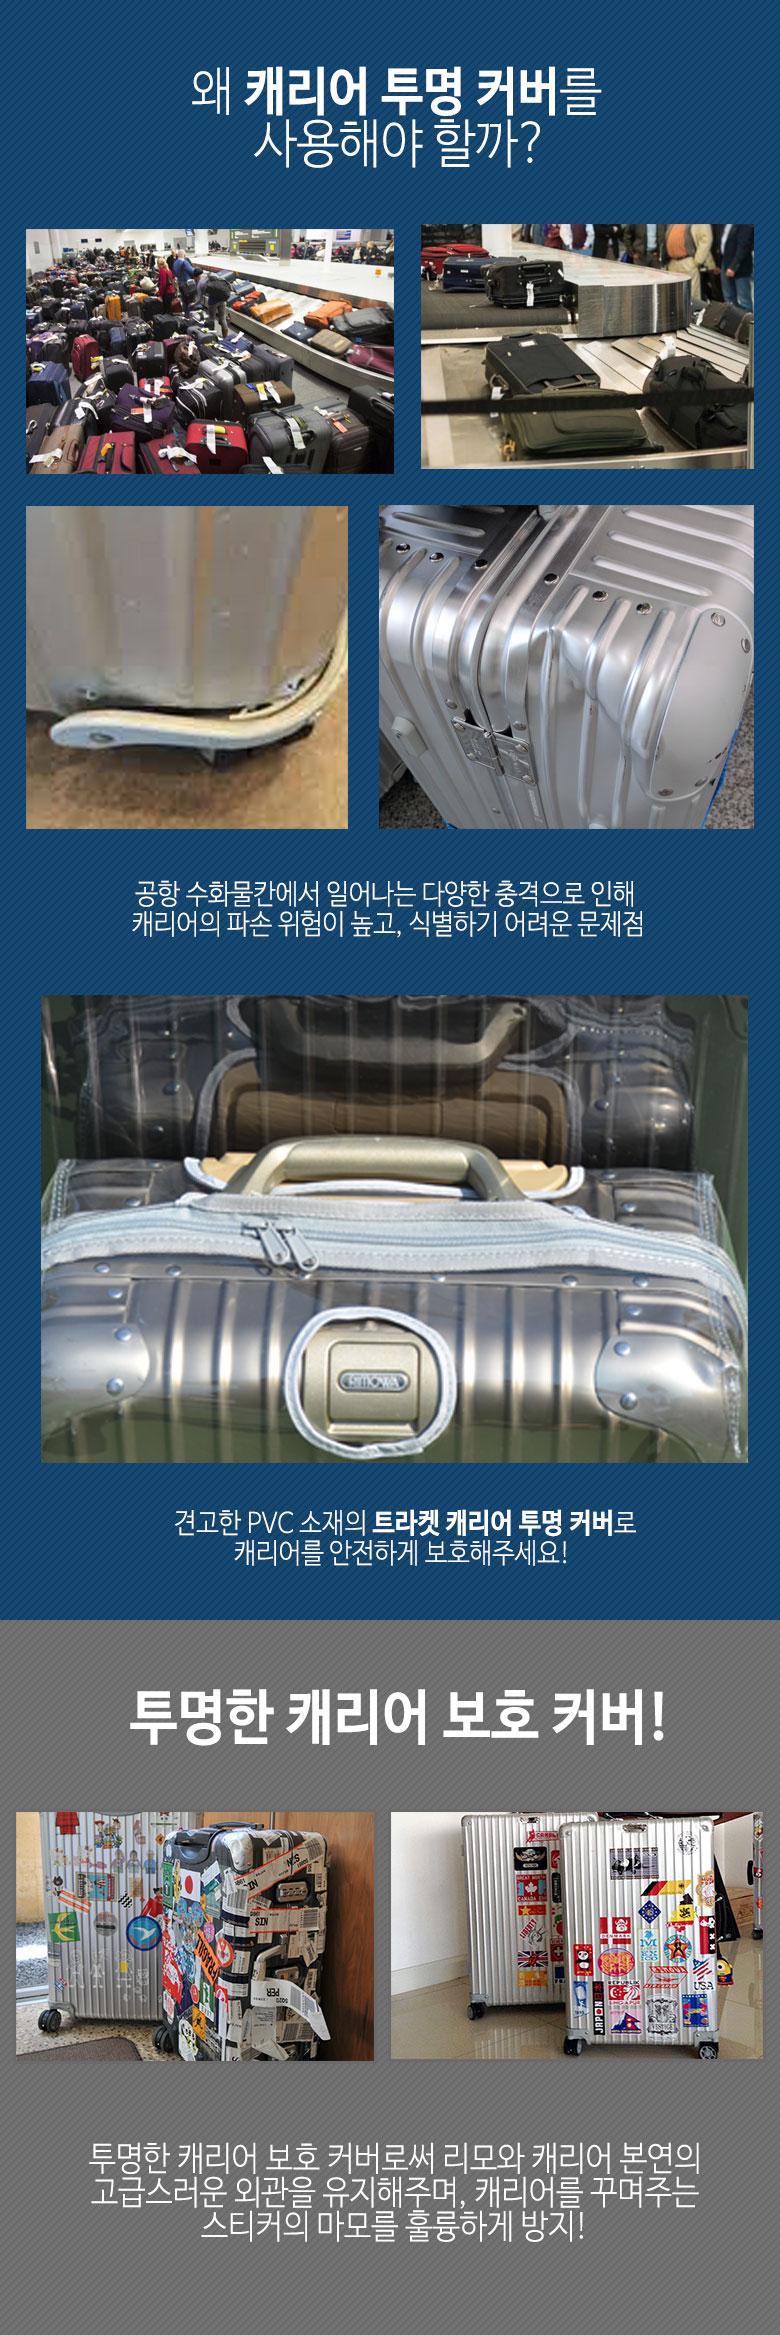 TRAKET 트라켓 2세대 리모와 림보 LIMBO 시리즈 캐리어 투명 커버 - 올웨이즈, 45,000원, 보호커버/스티커, 대형(25형) 이상